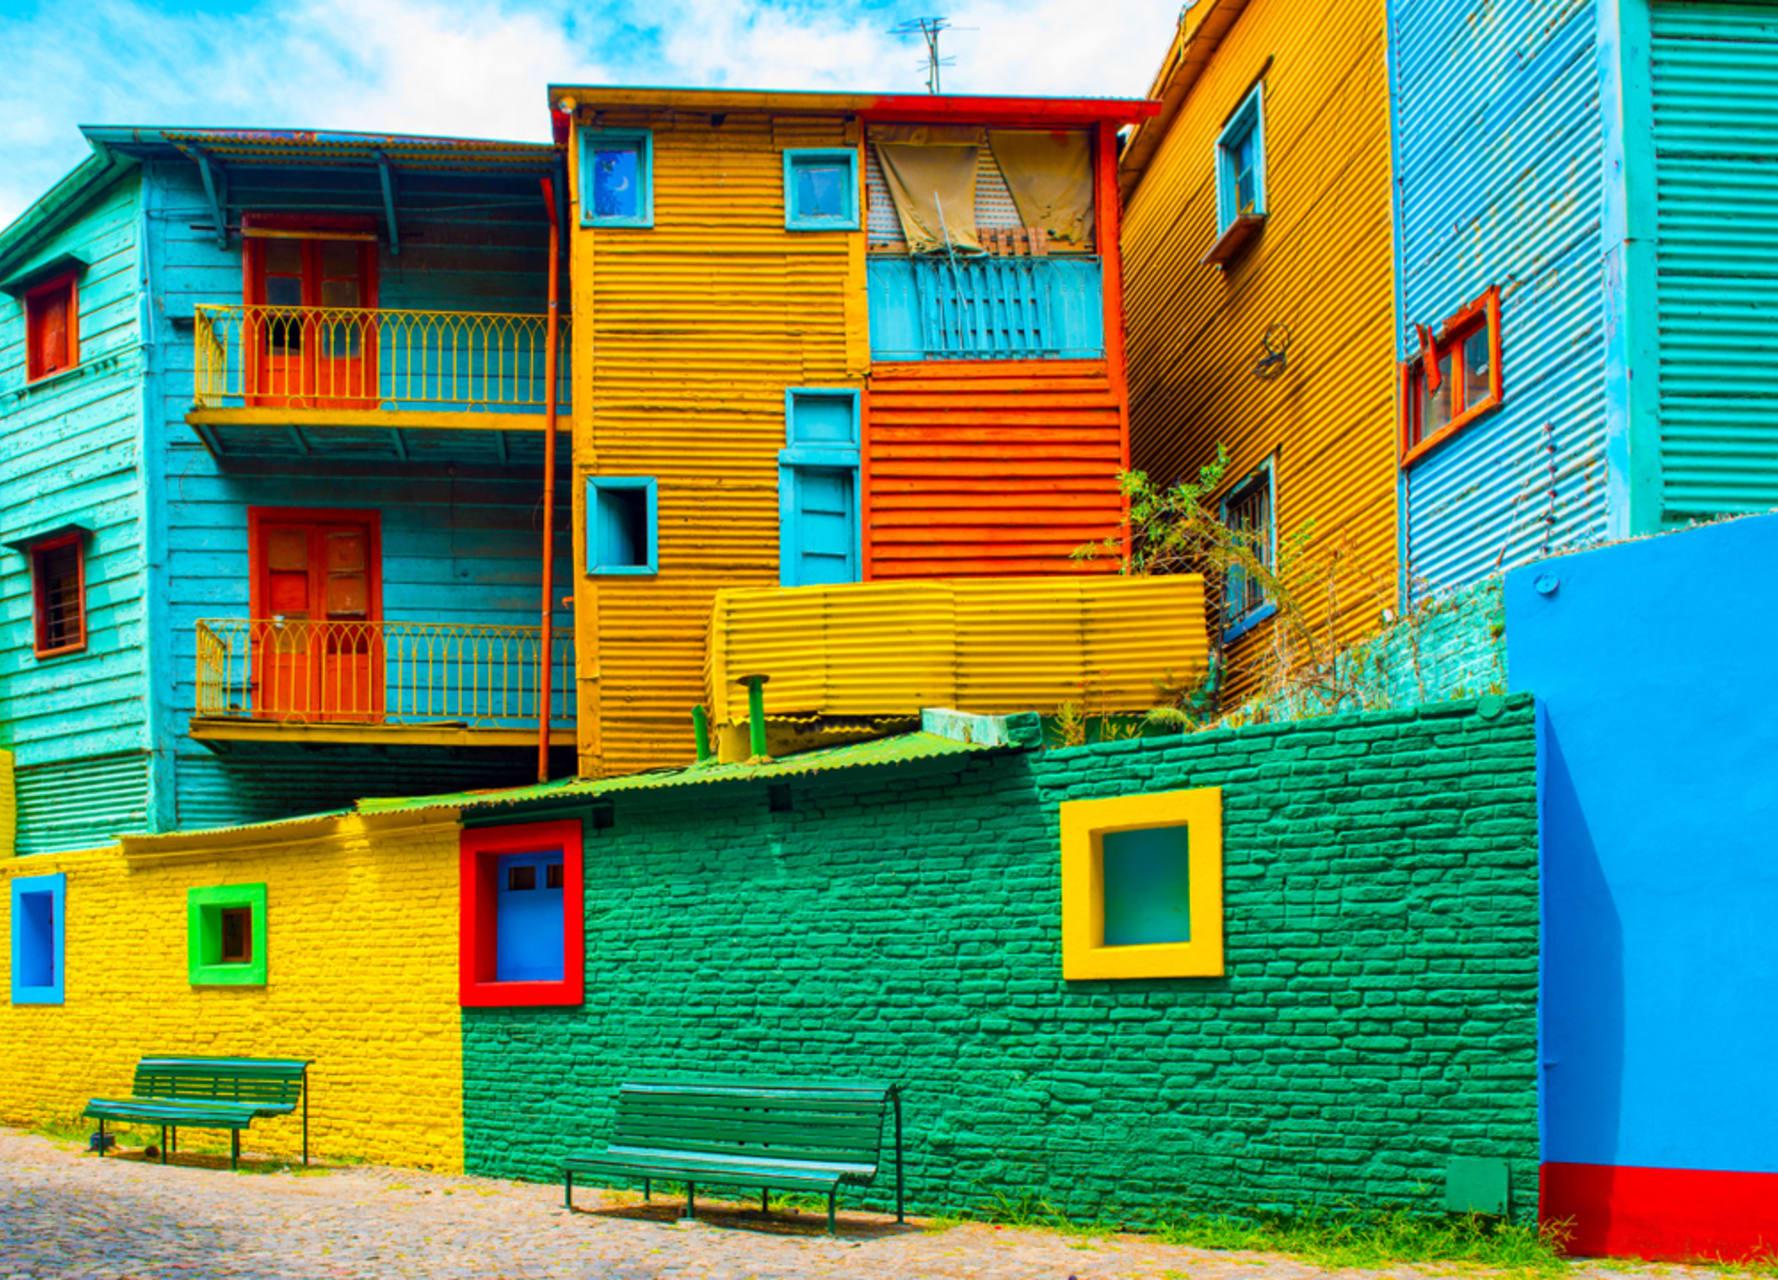 Buenos Aires - Buenos Aires: Caminito at La Boca, Tango and Colours